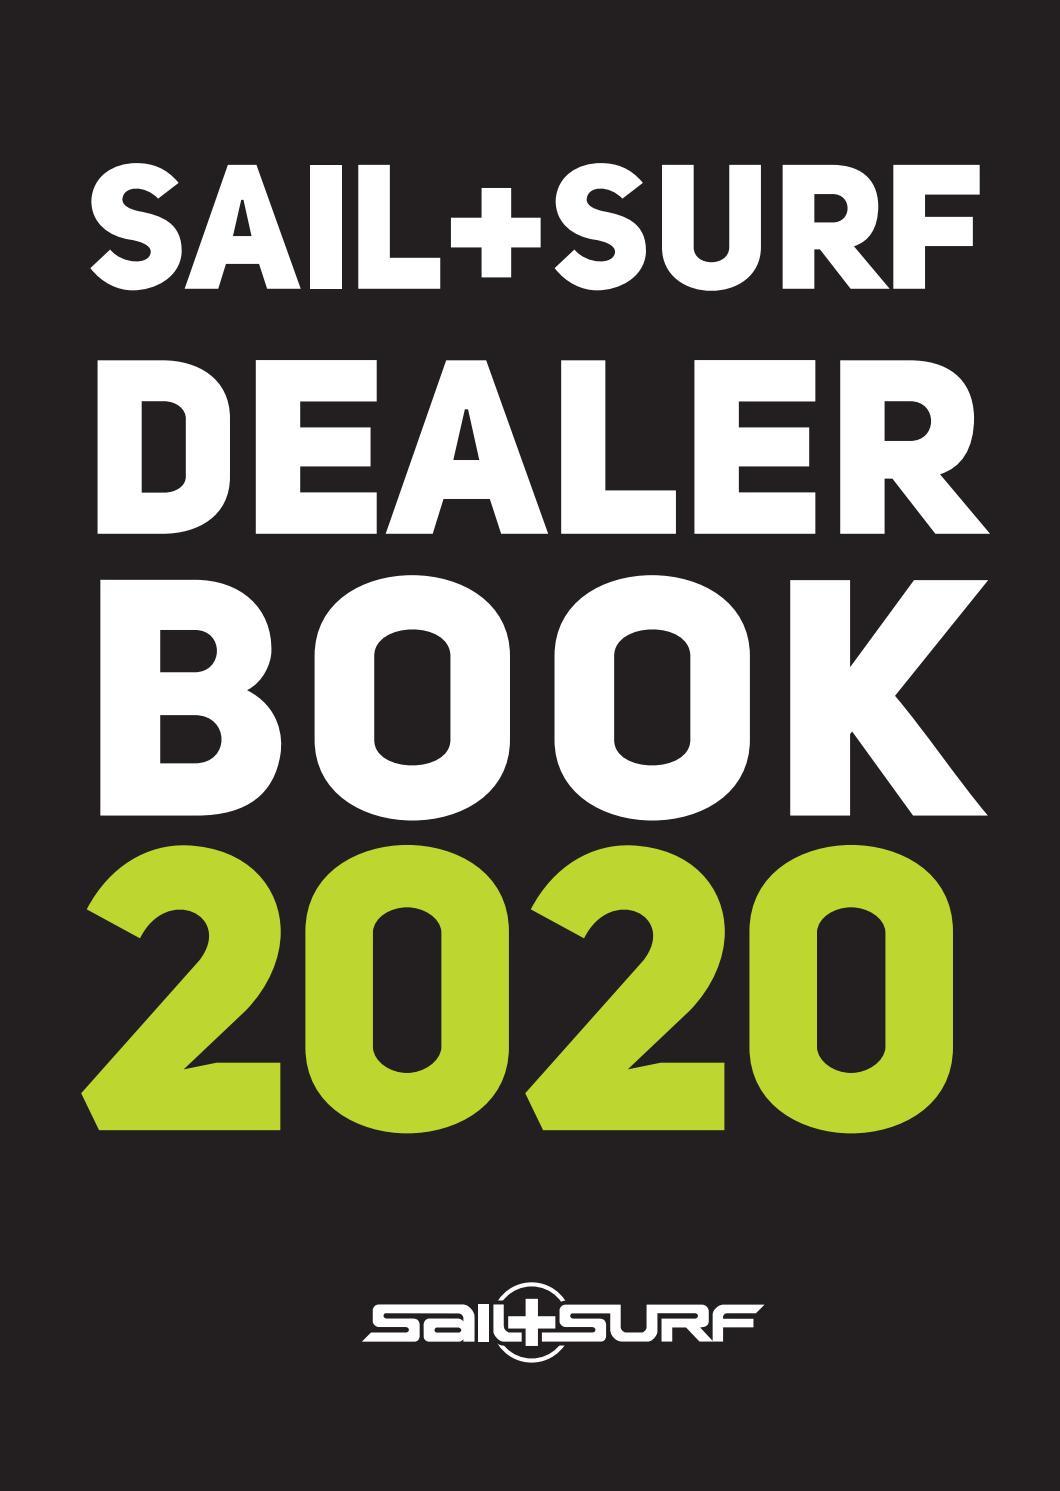 Sail Surf Dealer Book 2020 By Sail Surf Issuu